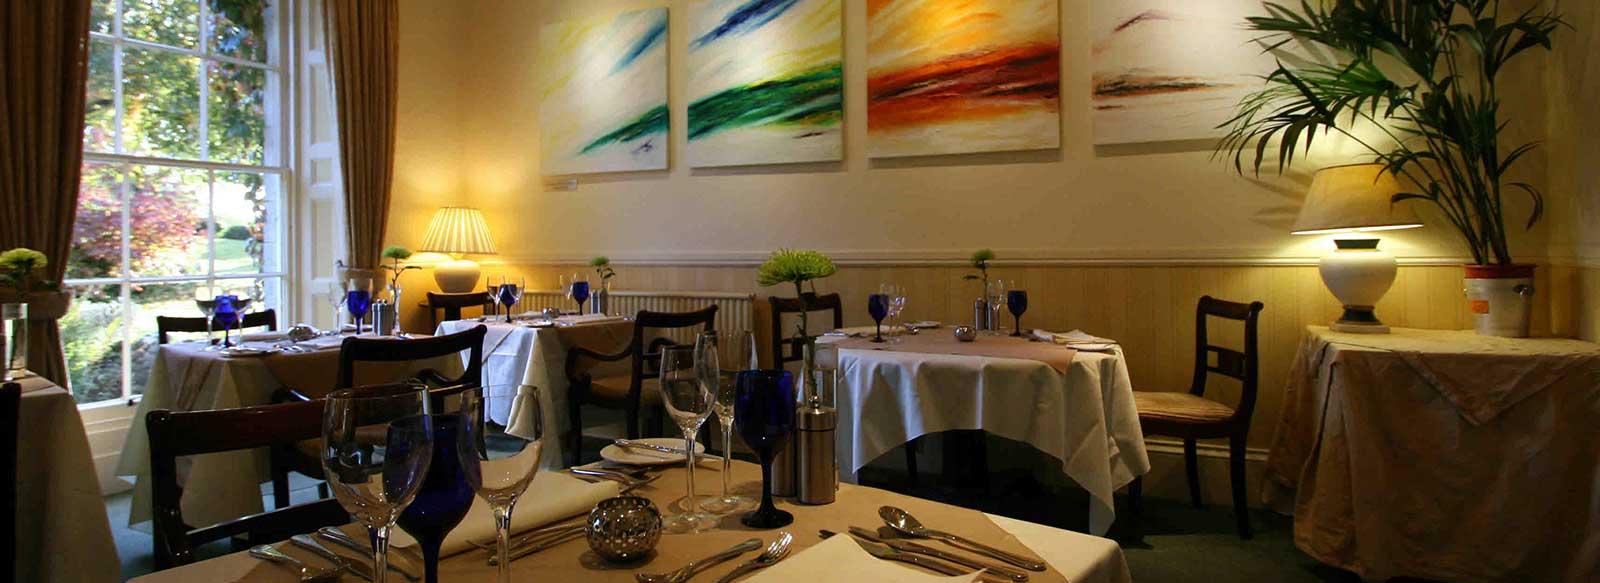 restaurant in Oswestry